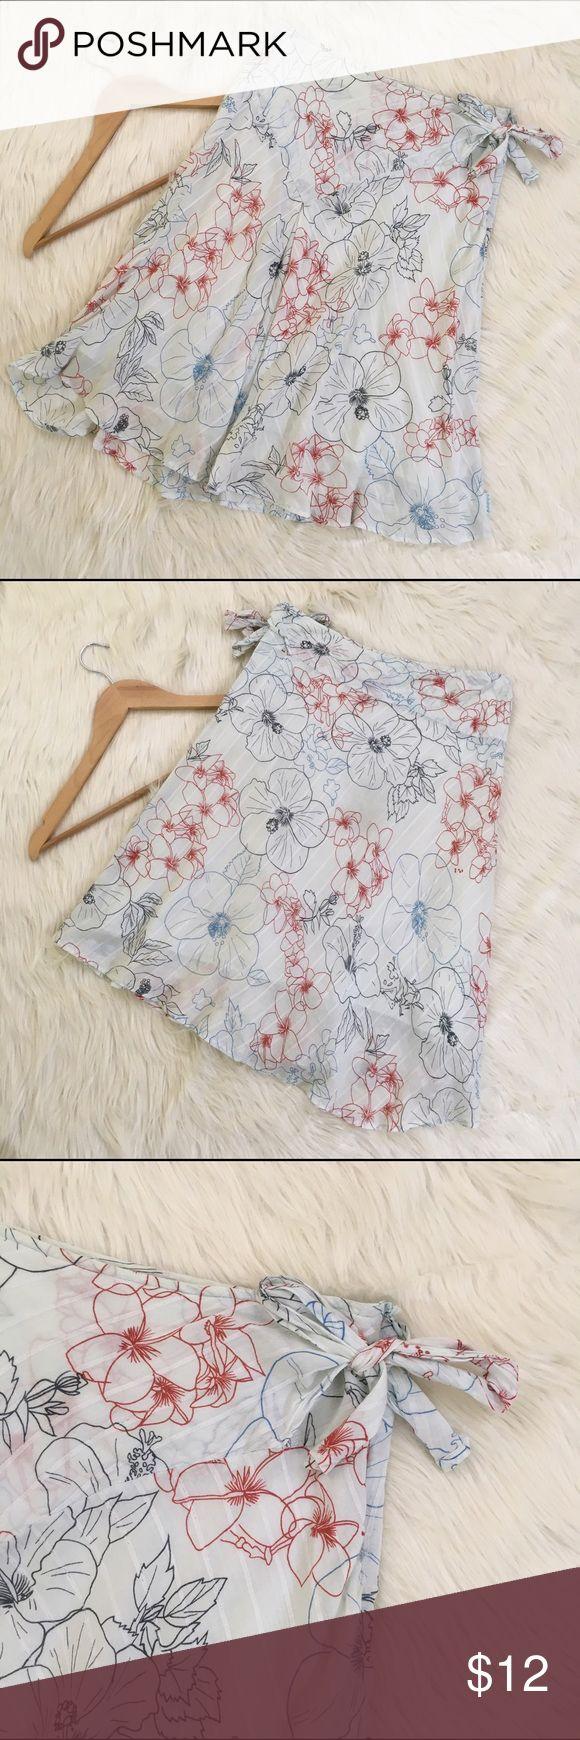 "💄Billabong Hawaiian Asymmetrical Hem Skirt Size 1 Billabong women's linen, Hawaiian floral skirt size 1. Tie waist, mid calf/Midi length, slightly asymmetrical. Light blue w/ blue and red designs. Perfect condition, no flaws. See photos for details.  Length: 23.5""  Waist flat: 14"" Billabong Skirts Asymmetrical"